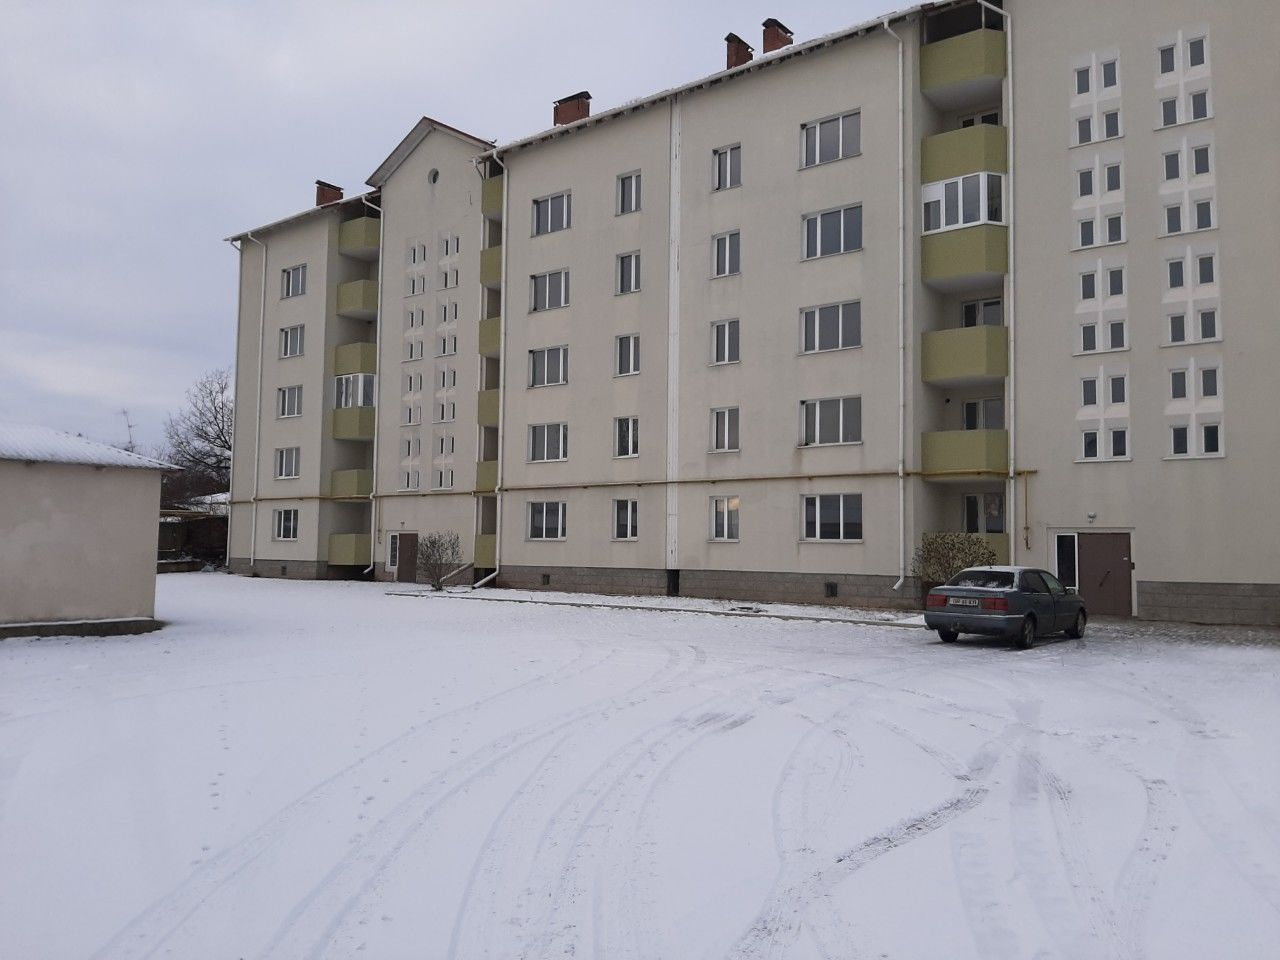 Briceni apartamente in casa noua la pret accesibil  Квартиры Новострой в центре Бричаны